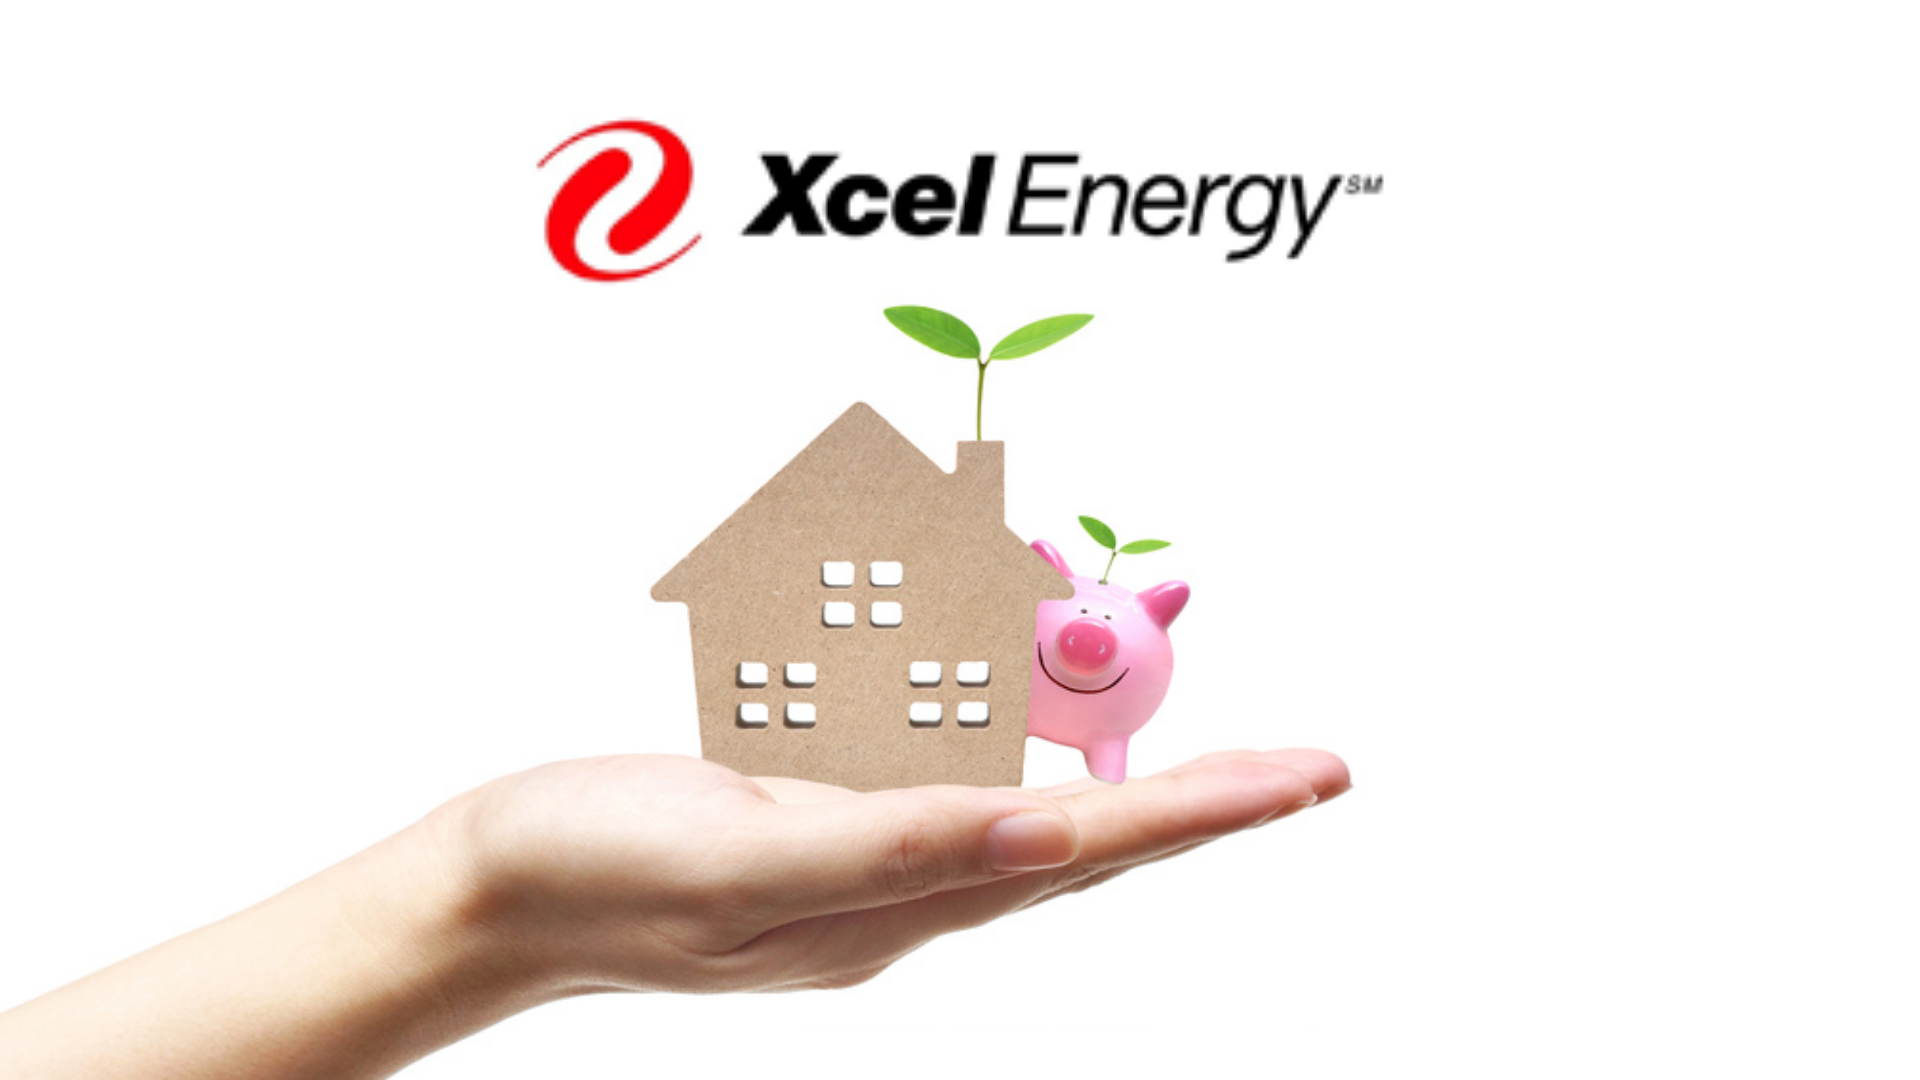 Xcel Energy Names Us 2020's Top 5 Rebate Producer